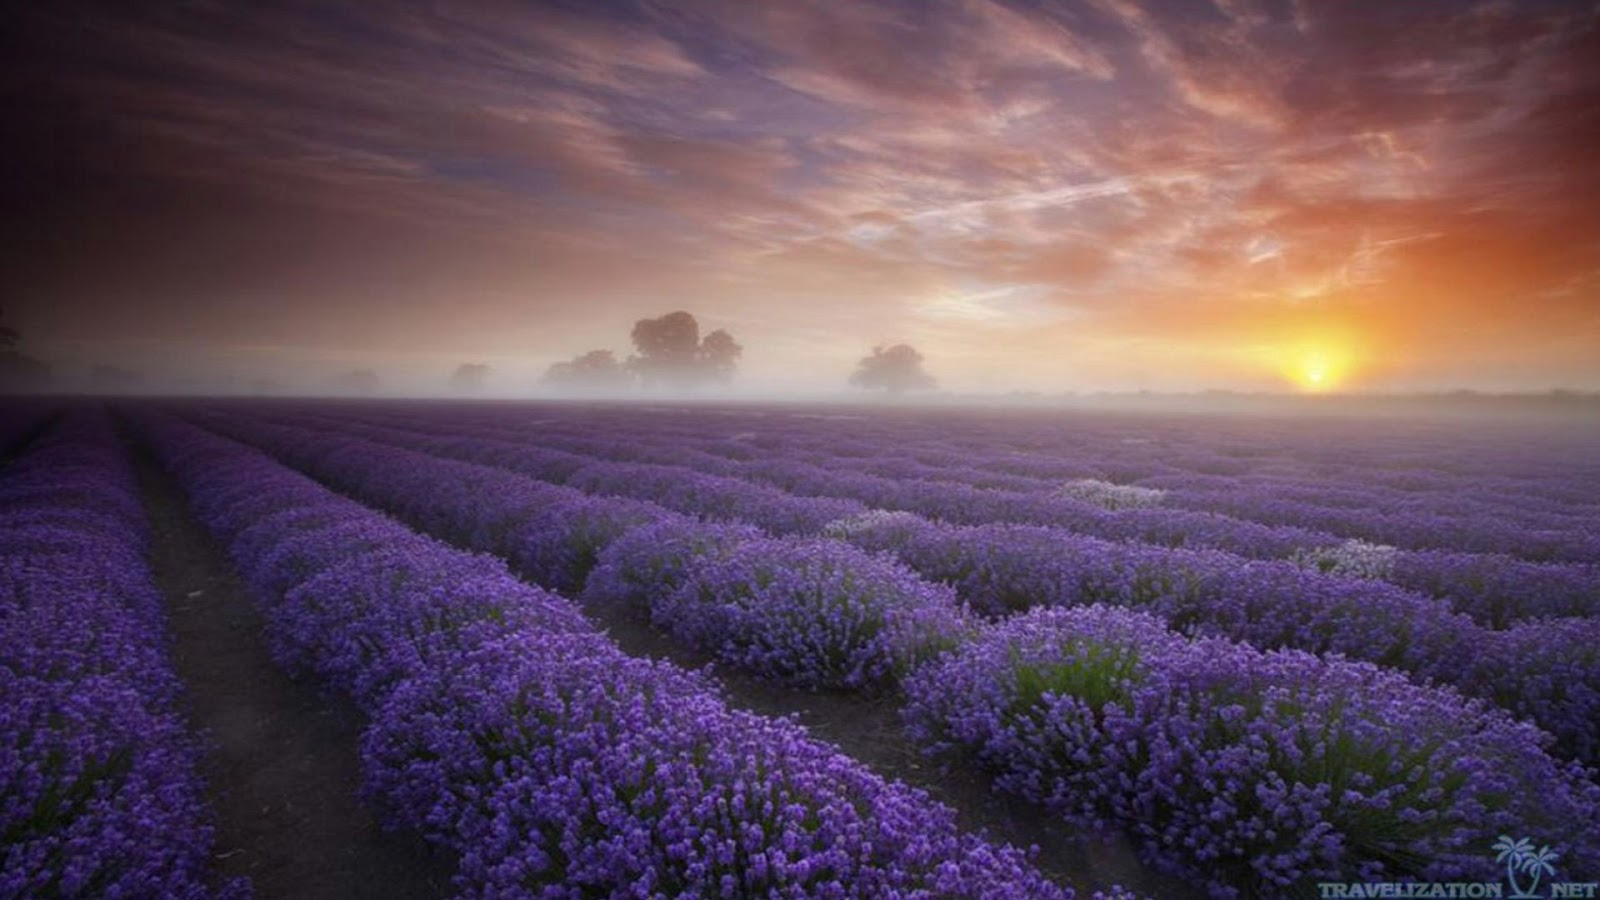 LavenderFieldWallpaperWallpapersafari